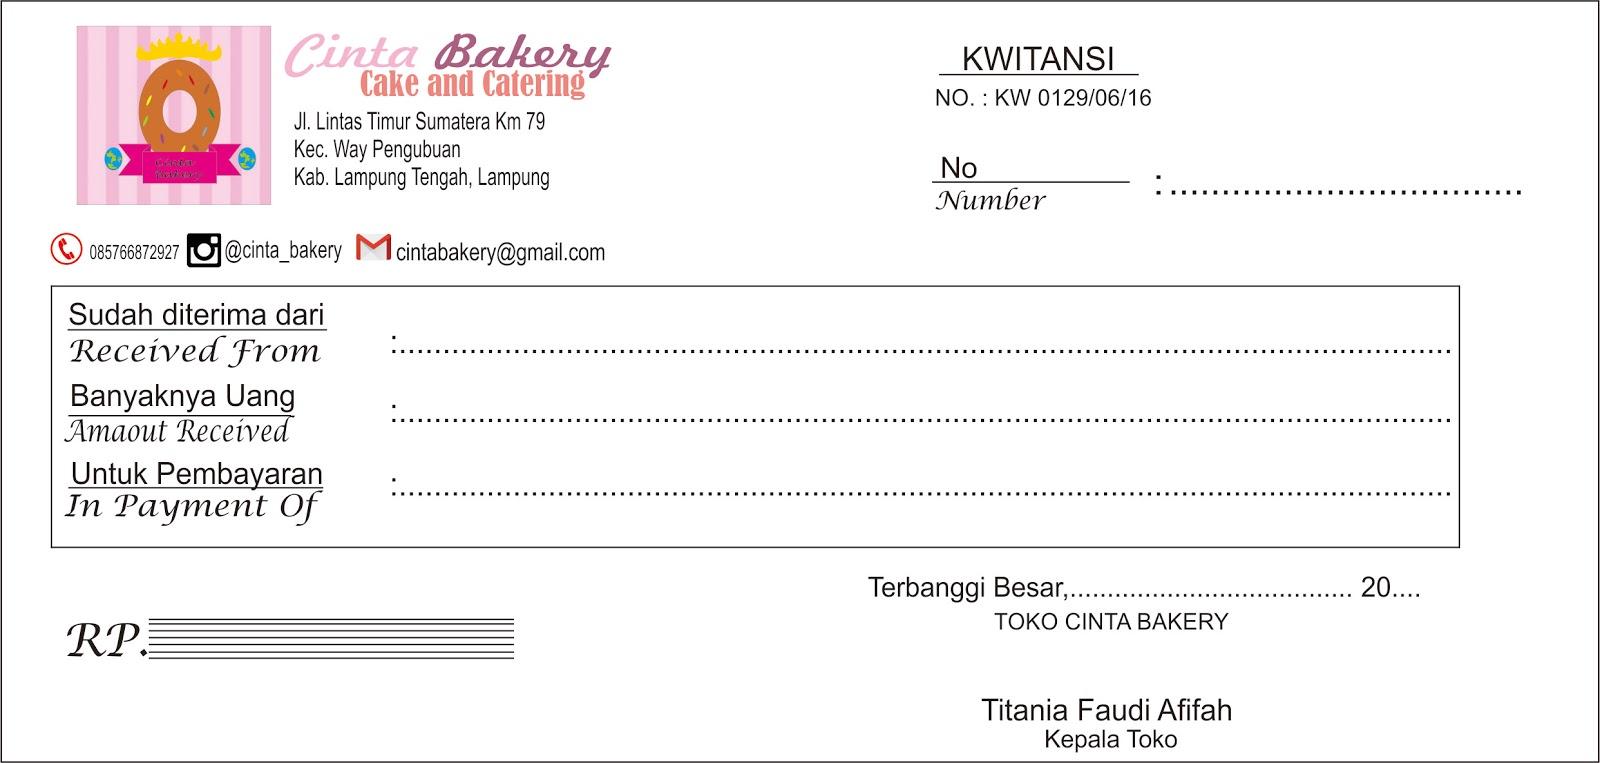 Pengertian Kwitansi Titania Faudi Afifah